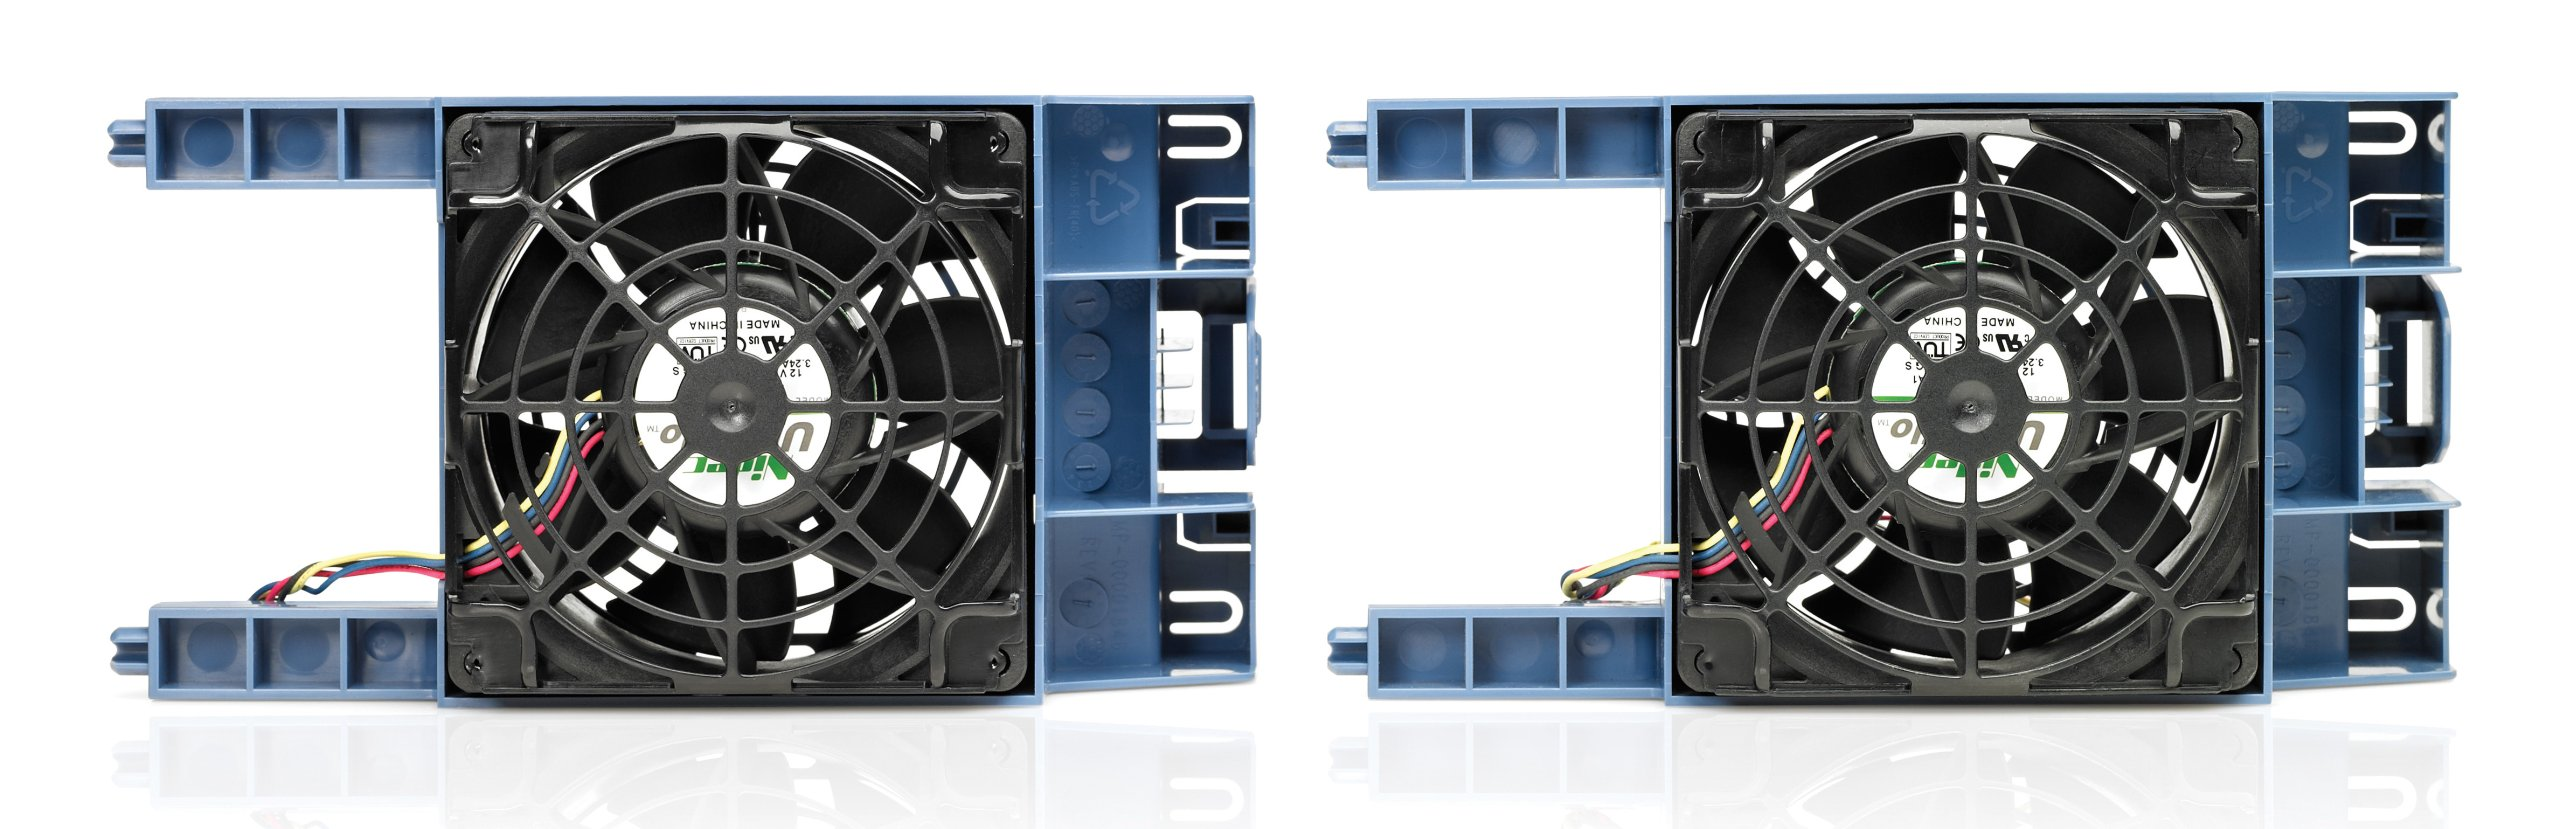 HP System Fan Kit Cooling 725878-B21 by HP